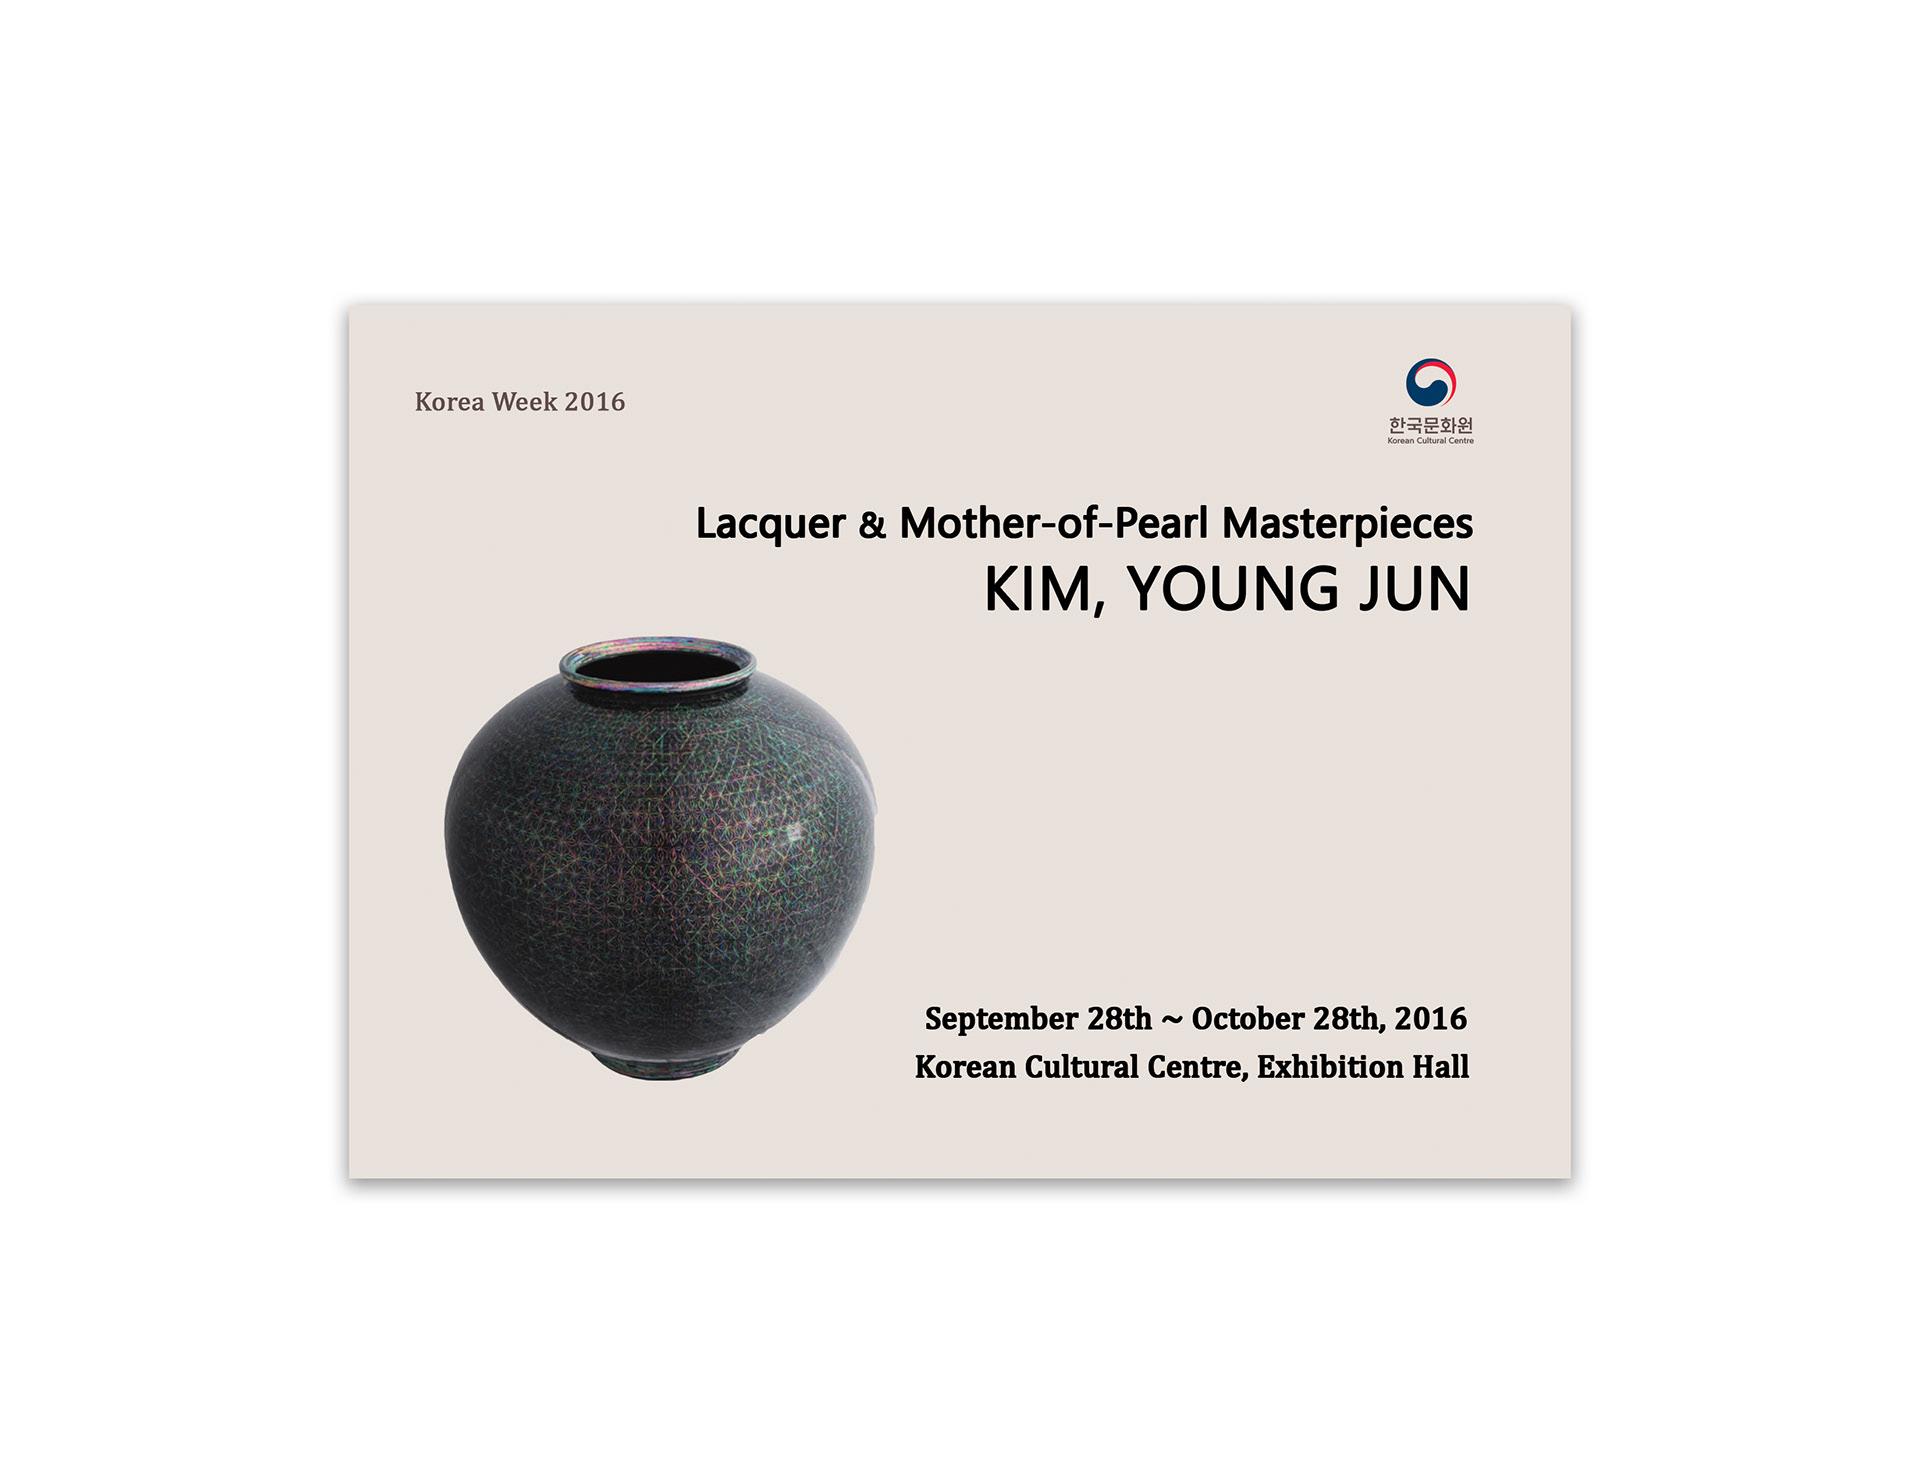 Lena kim exhibition invitation card exhibition invitation card stopboris Image collections